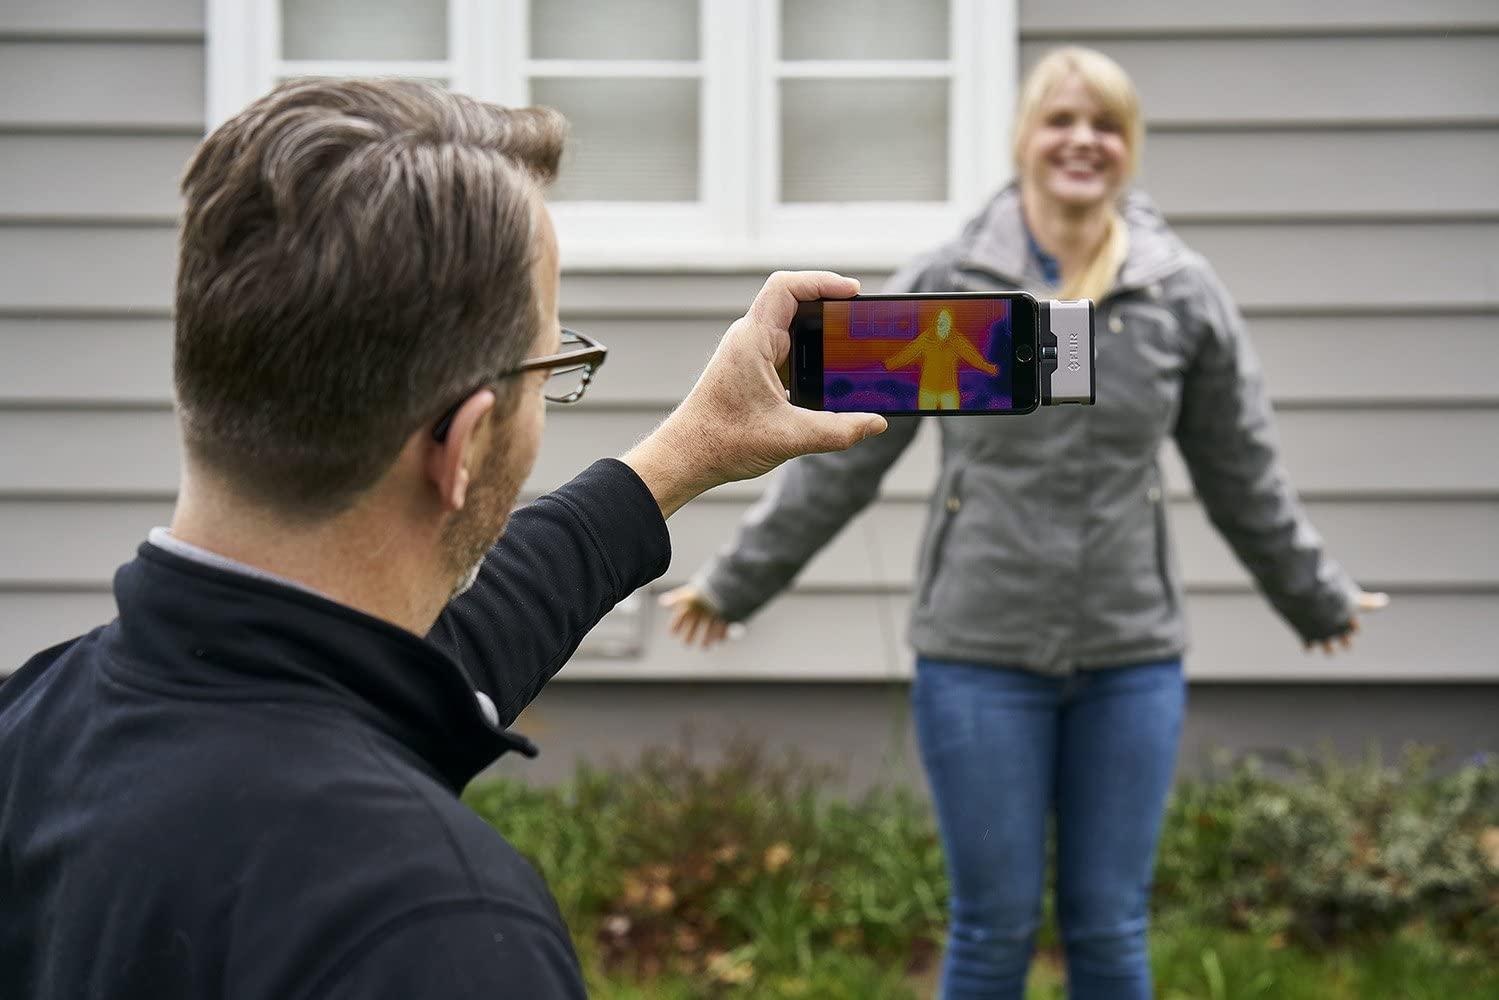 Câmera Termográfica para Celular 4.800 PIXELS (-20 °C A 120 °C) Flir One Gen 3 Android USB-C  - MRE Ferramentas